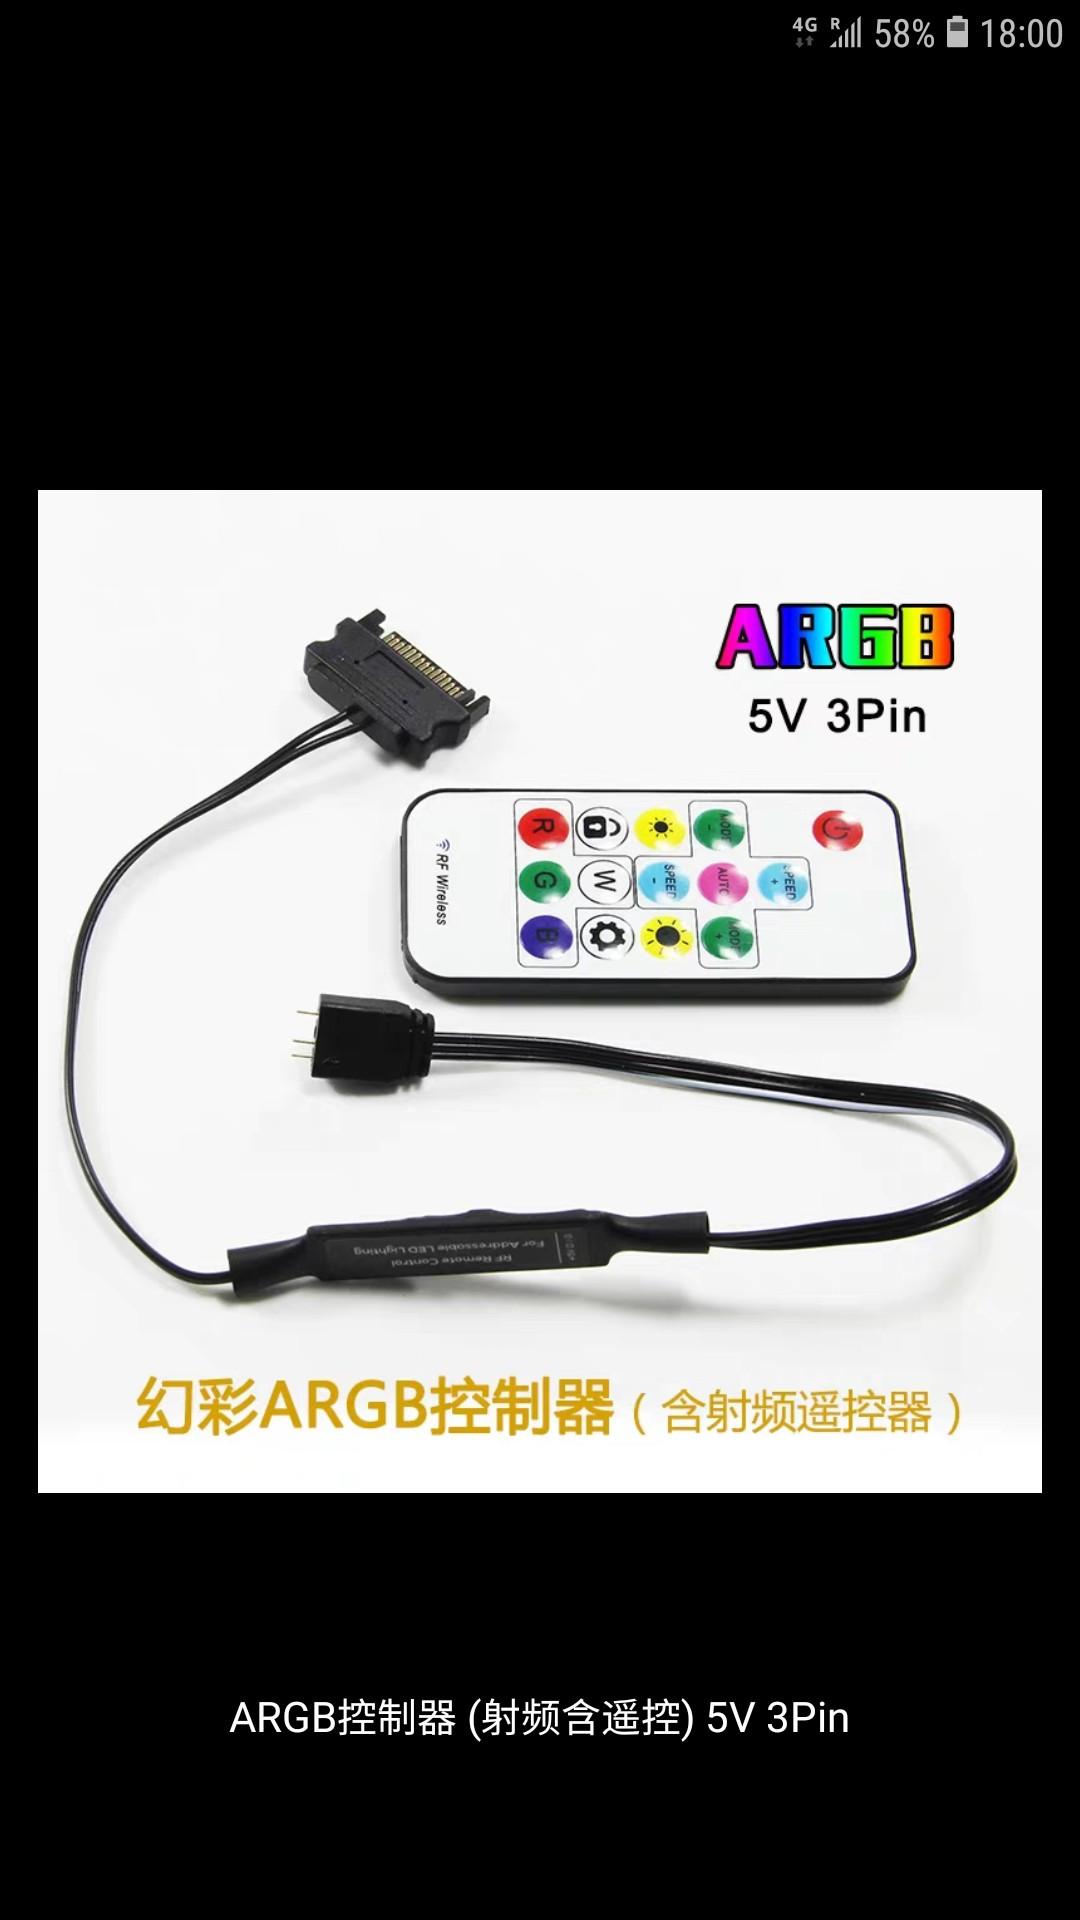 ARGB風扇- 散熱特區- 電腦領域HKEPC Hardware - 全港No 1 PC討論區